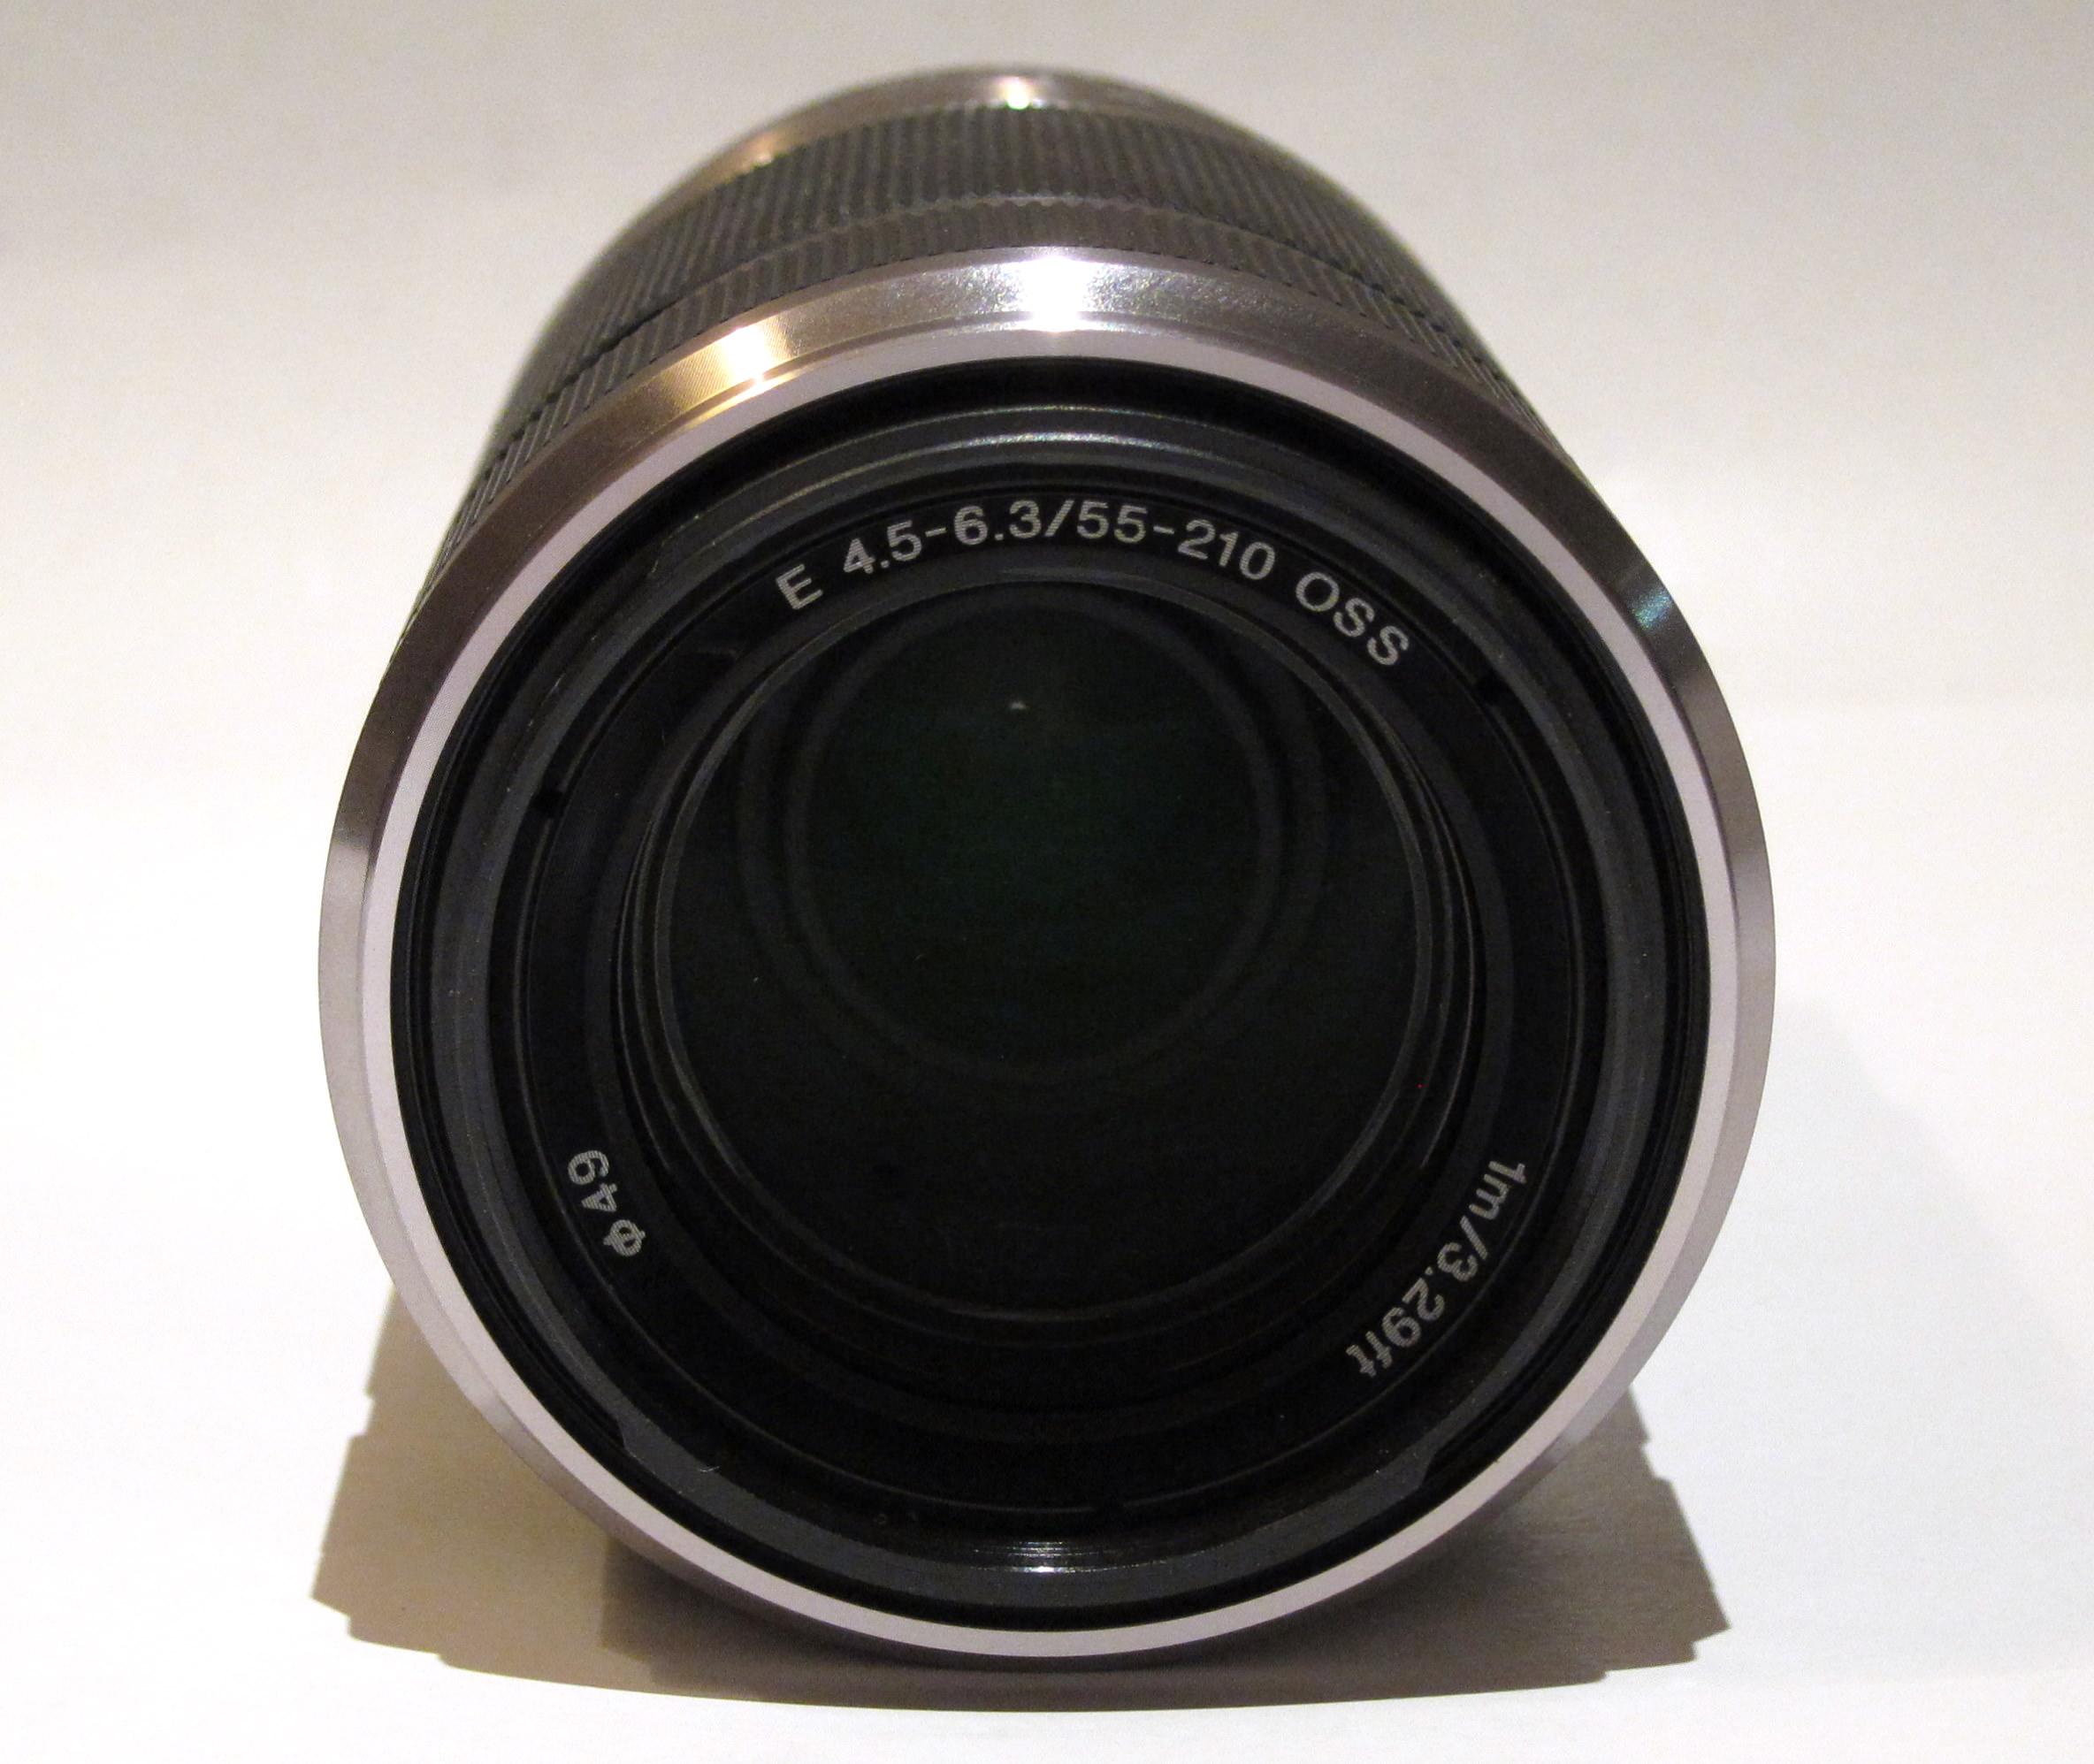 sony nex 55 210mm oss zoom lens sample photos. Black Bedroom Furniture Sets. Home Design Ideas